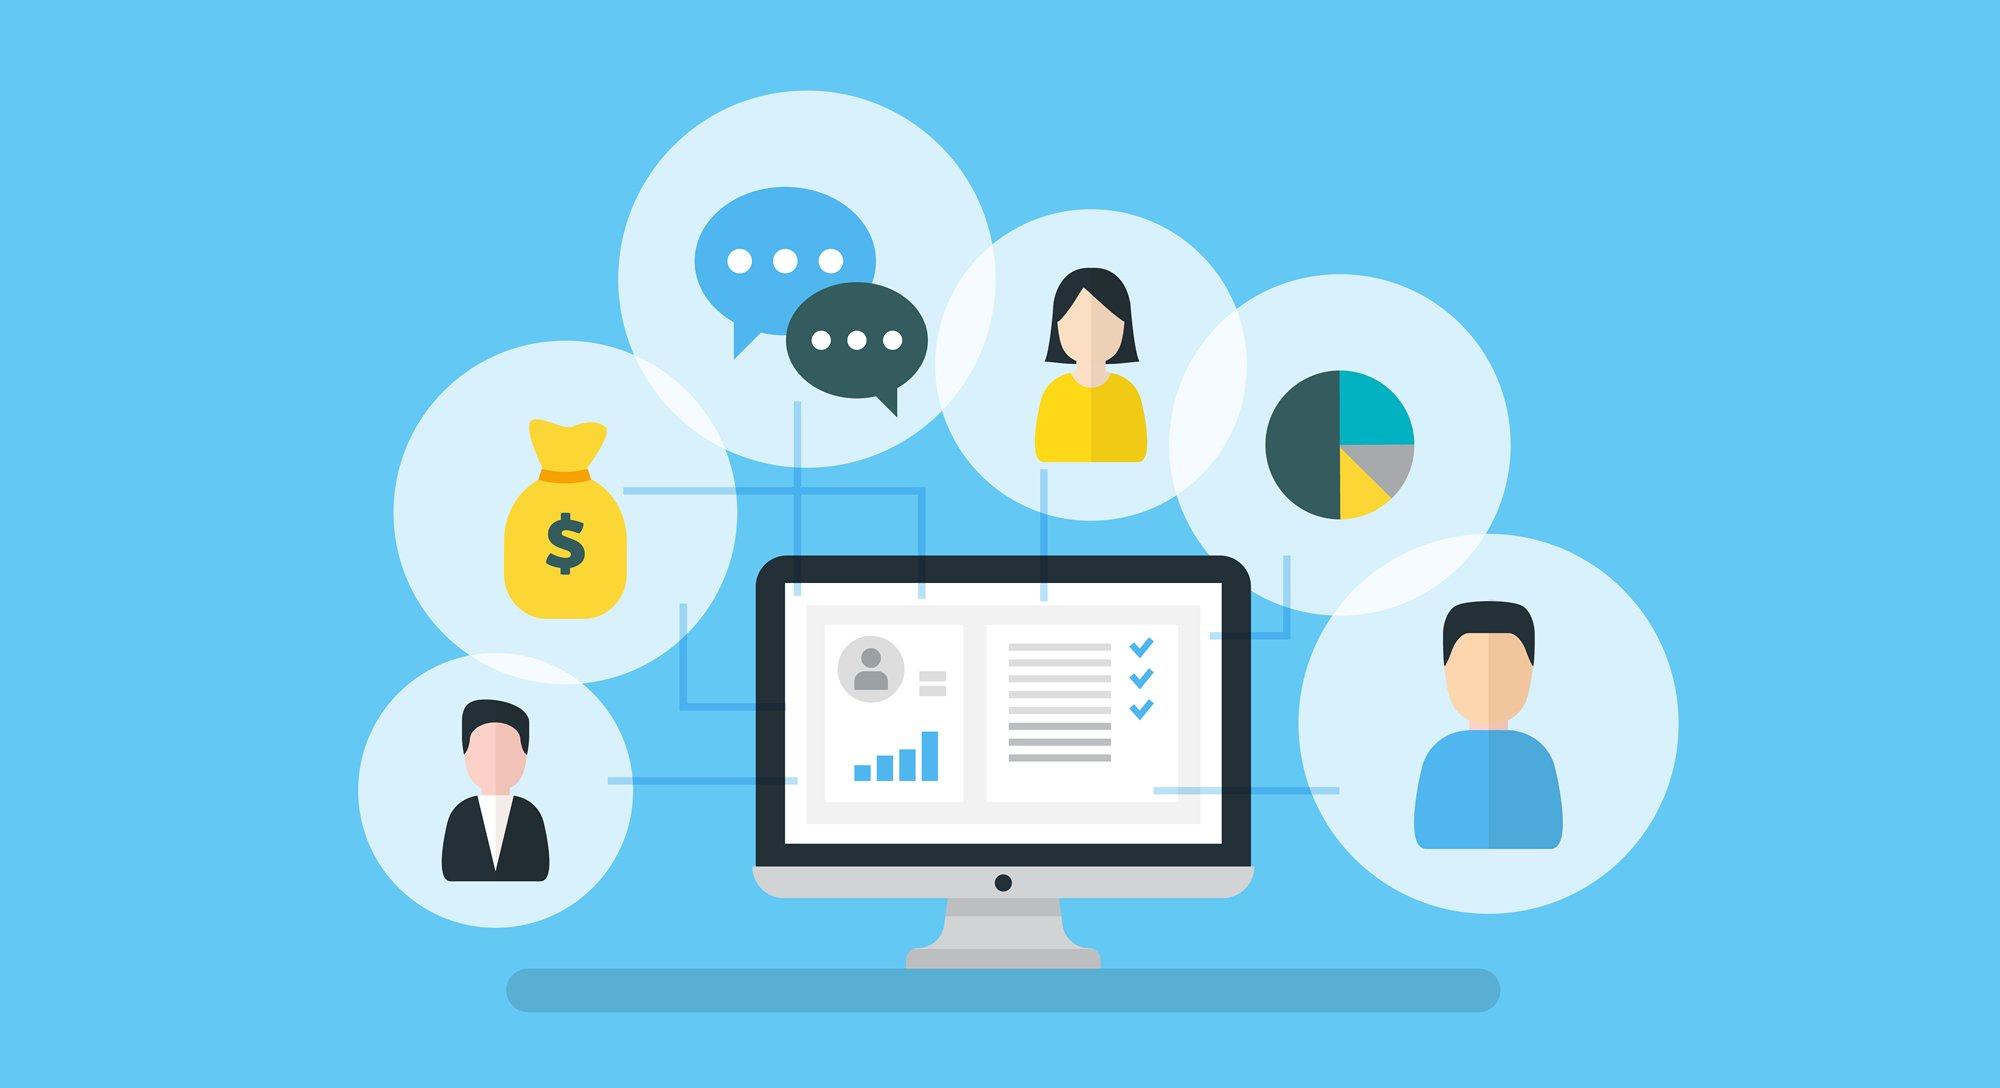 December 2017 - Proactive Account Management course image